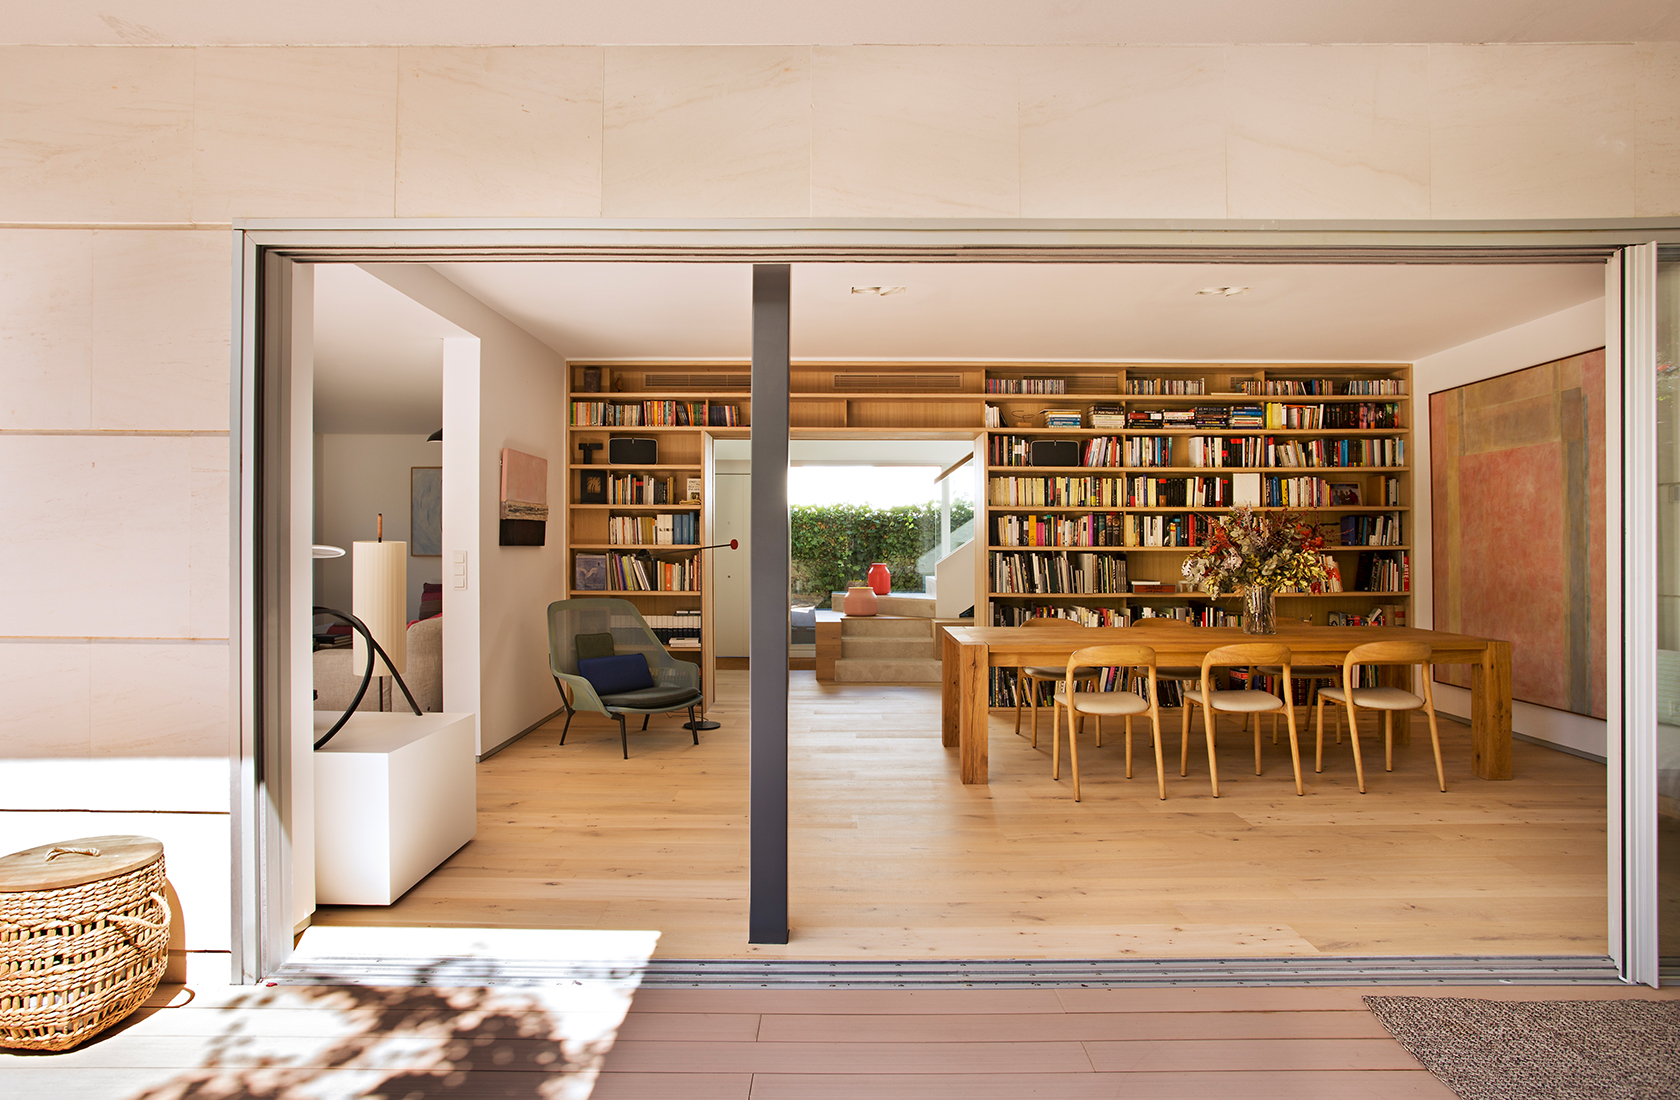 Reforma vivienda adosada moraleja ventanal libreria madera